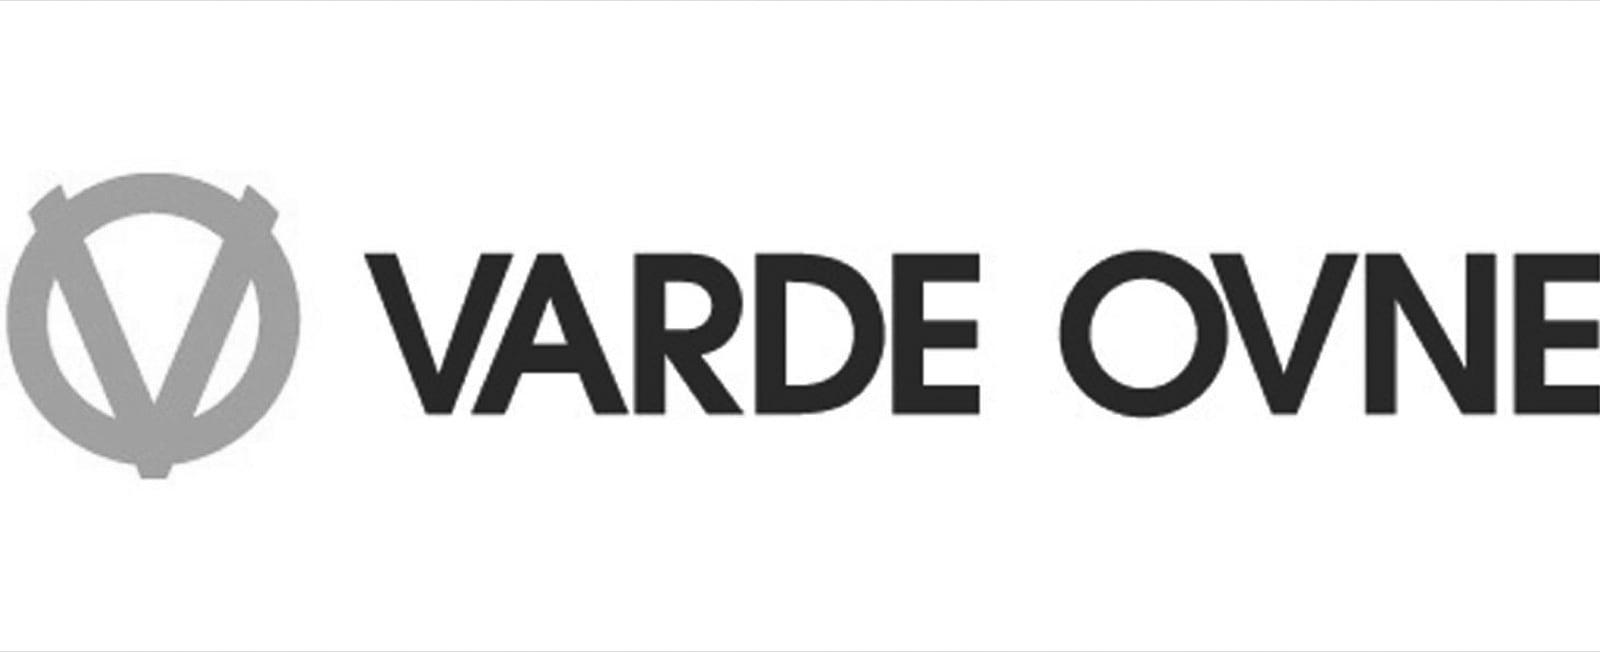 VARDE_LOGO